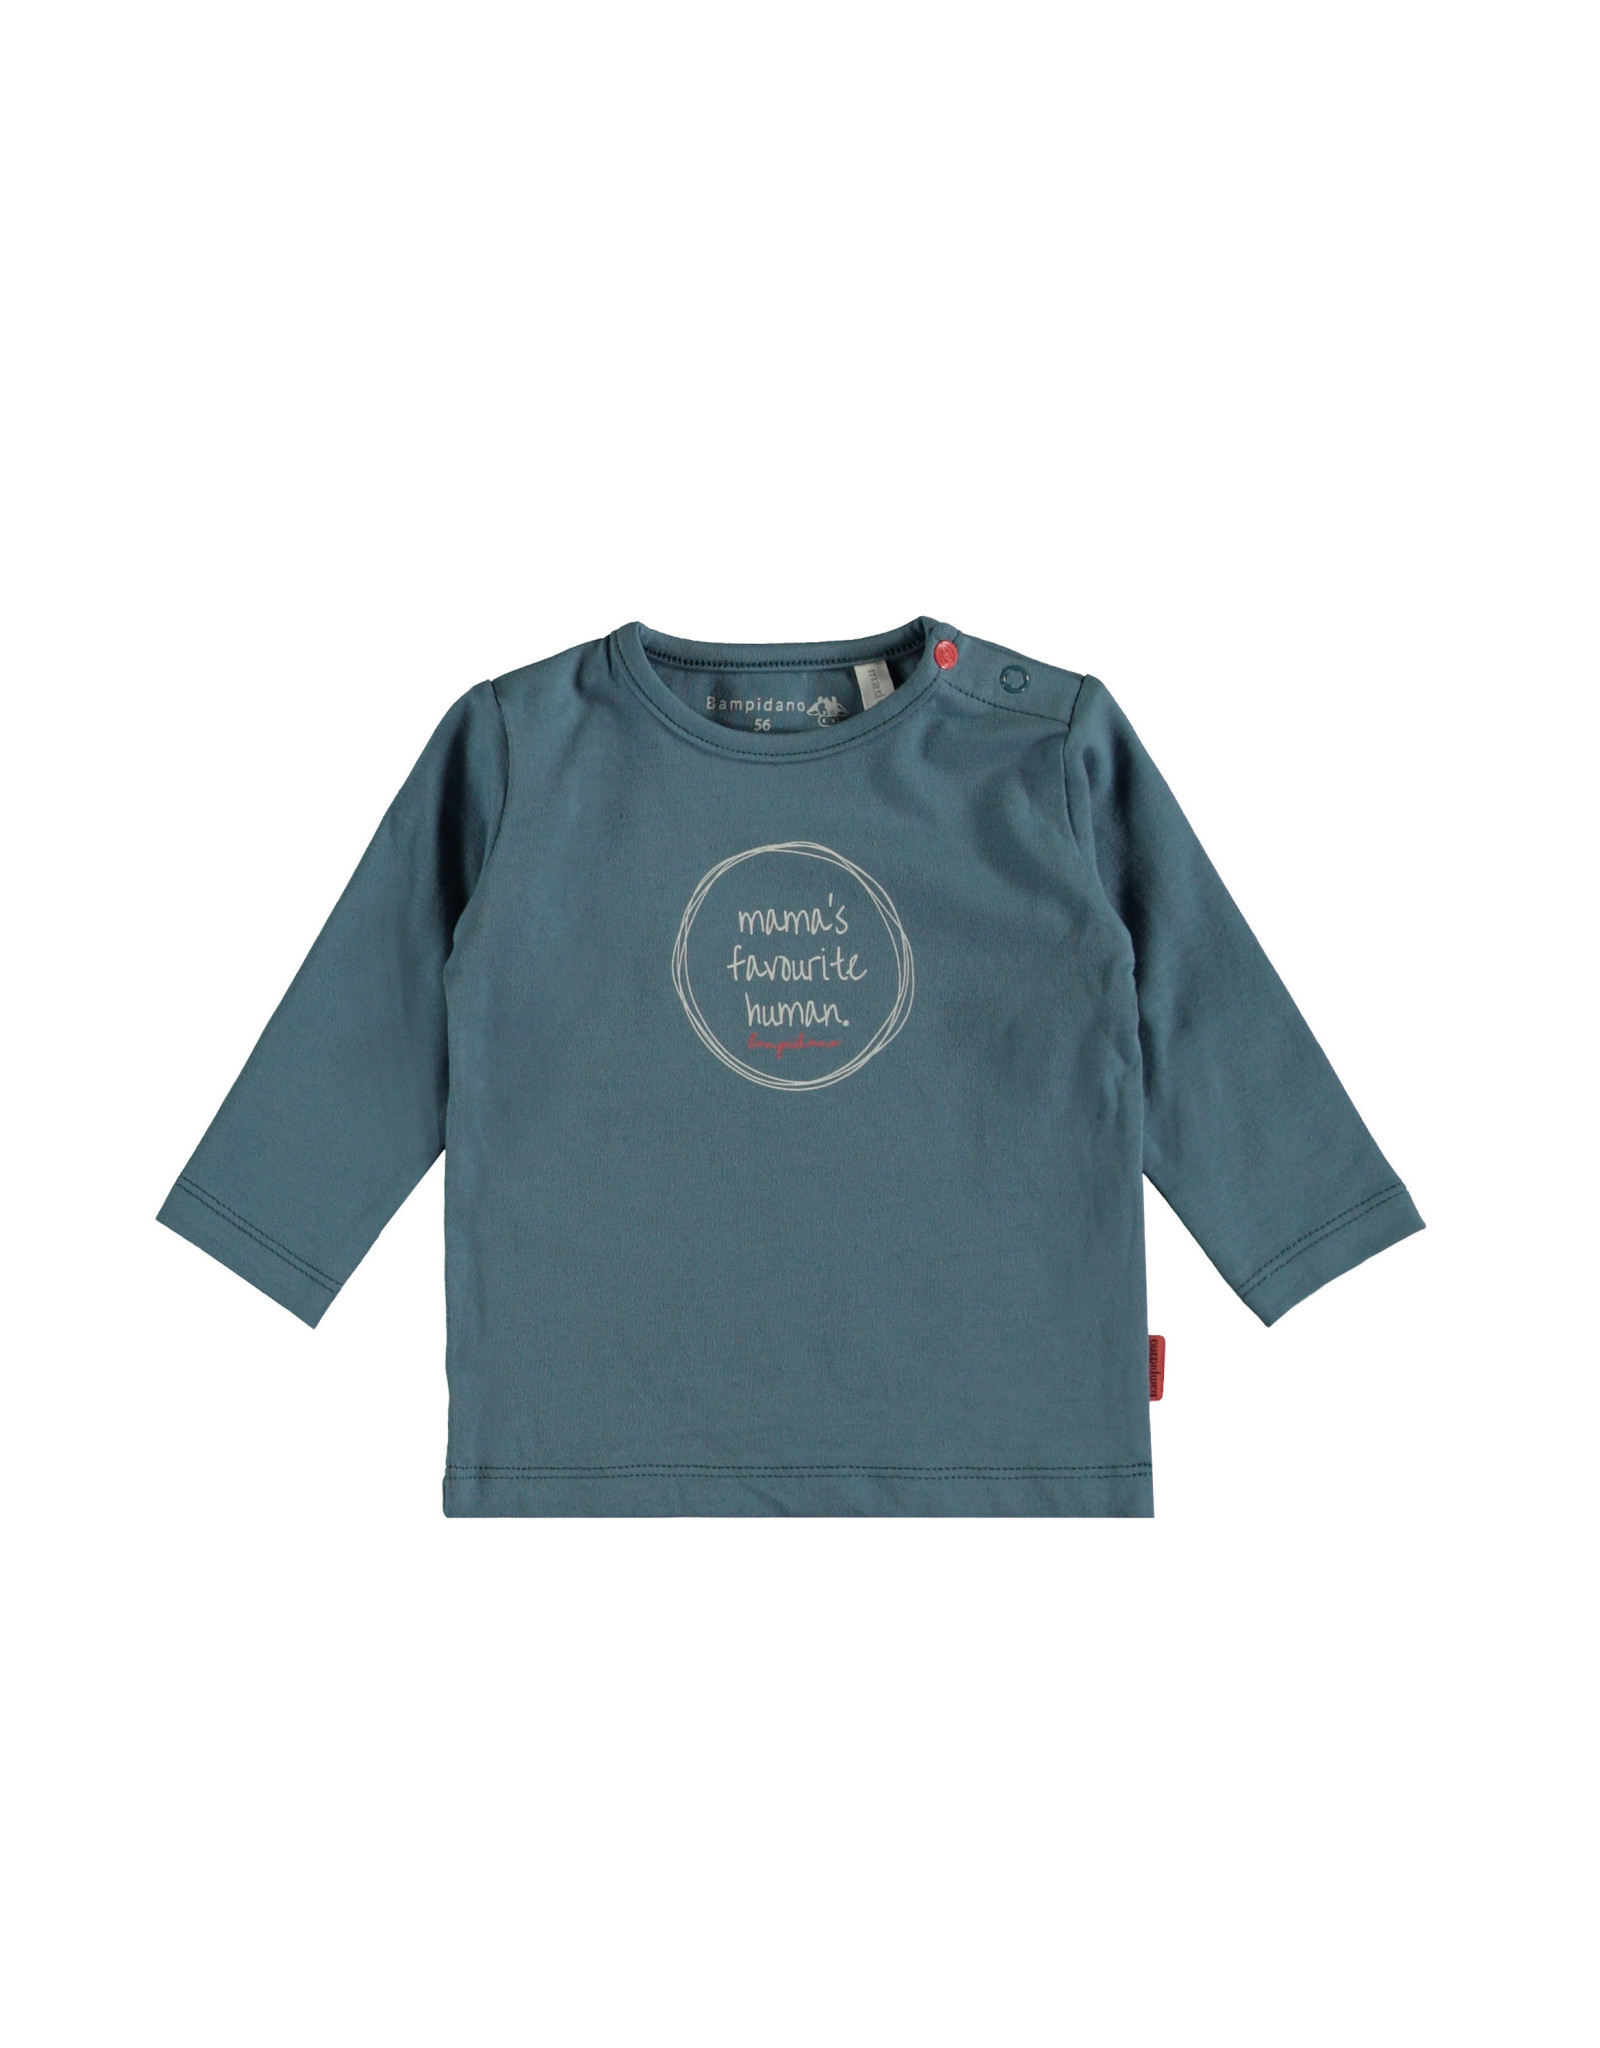 Bampidano Bampidano newborn shirt Fynn print Sloth Stone Blue